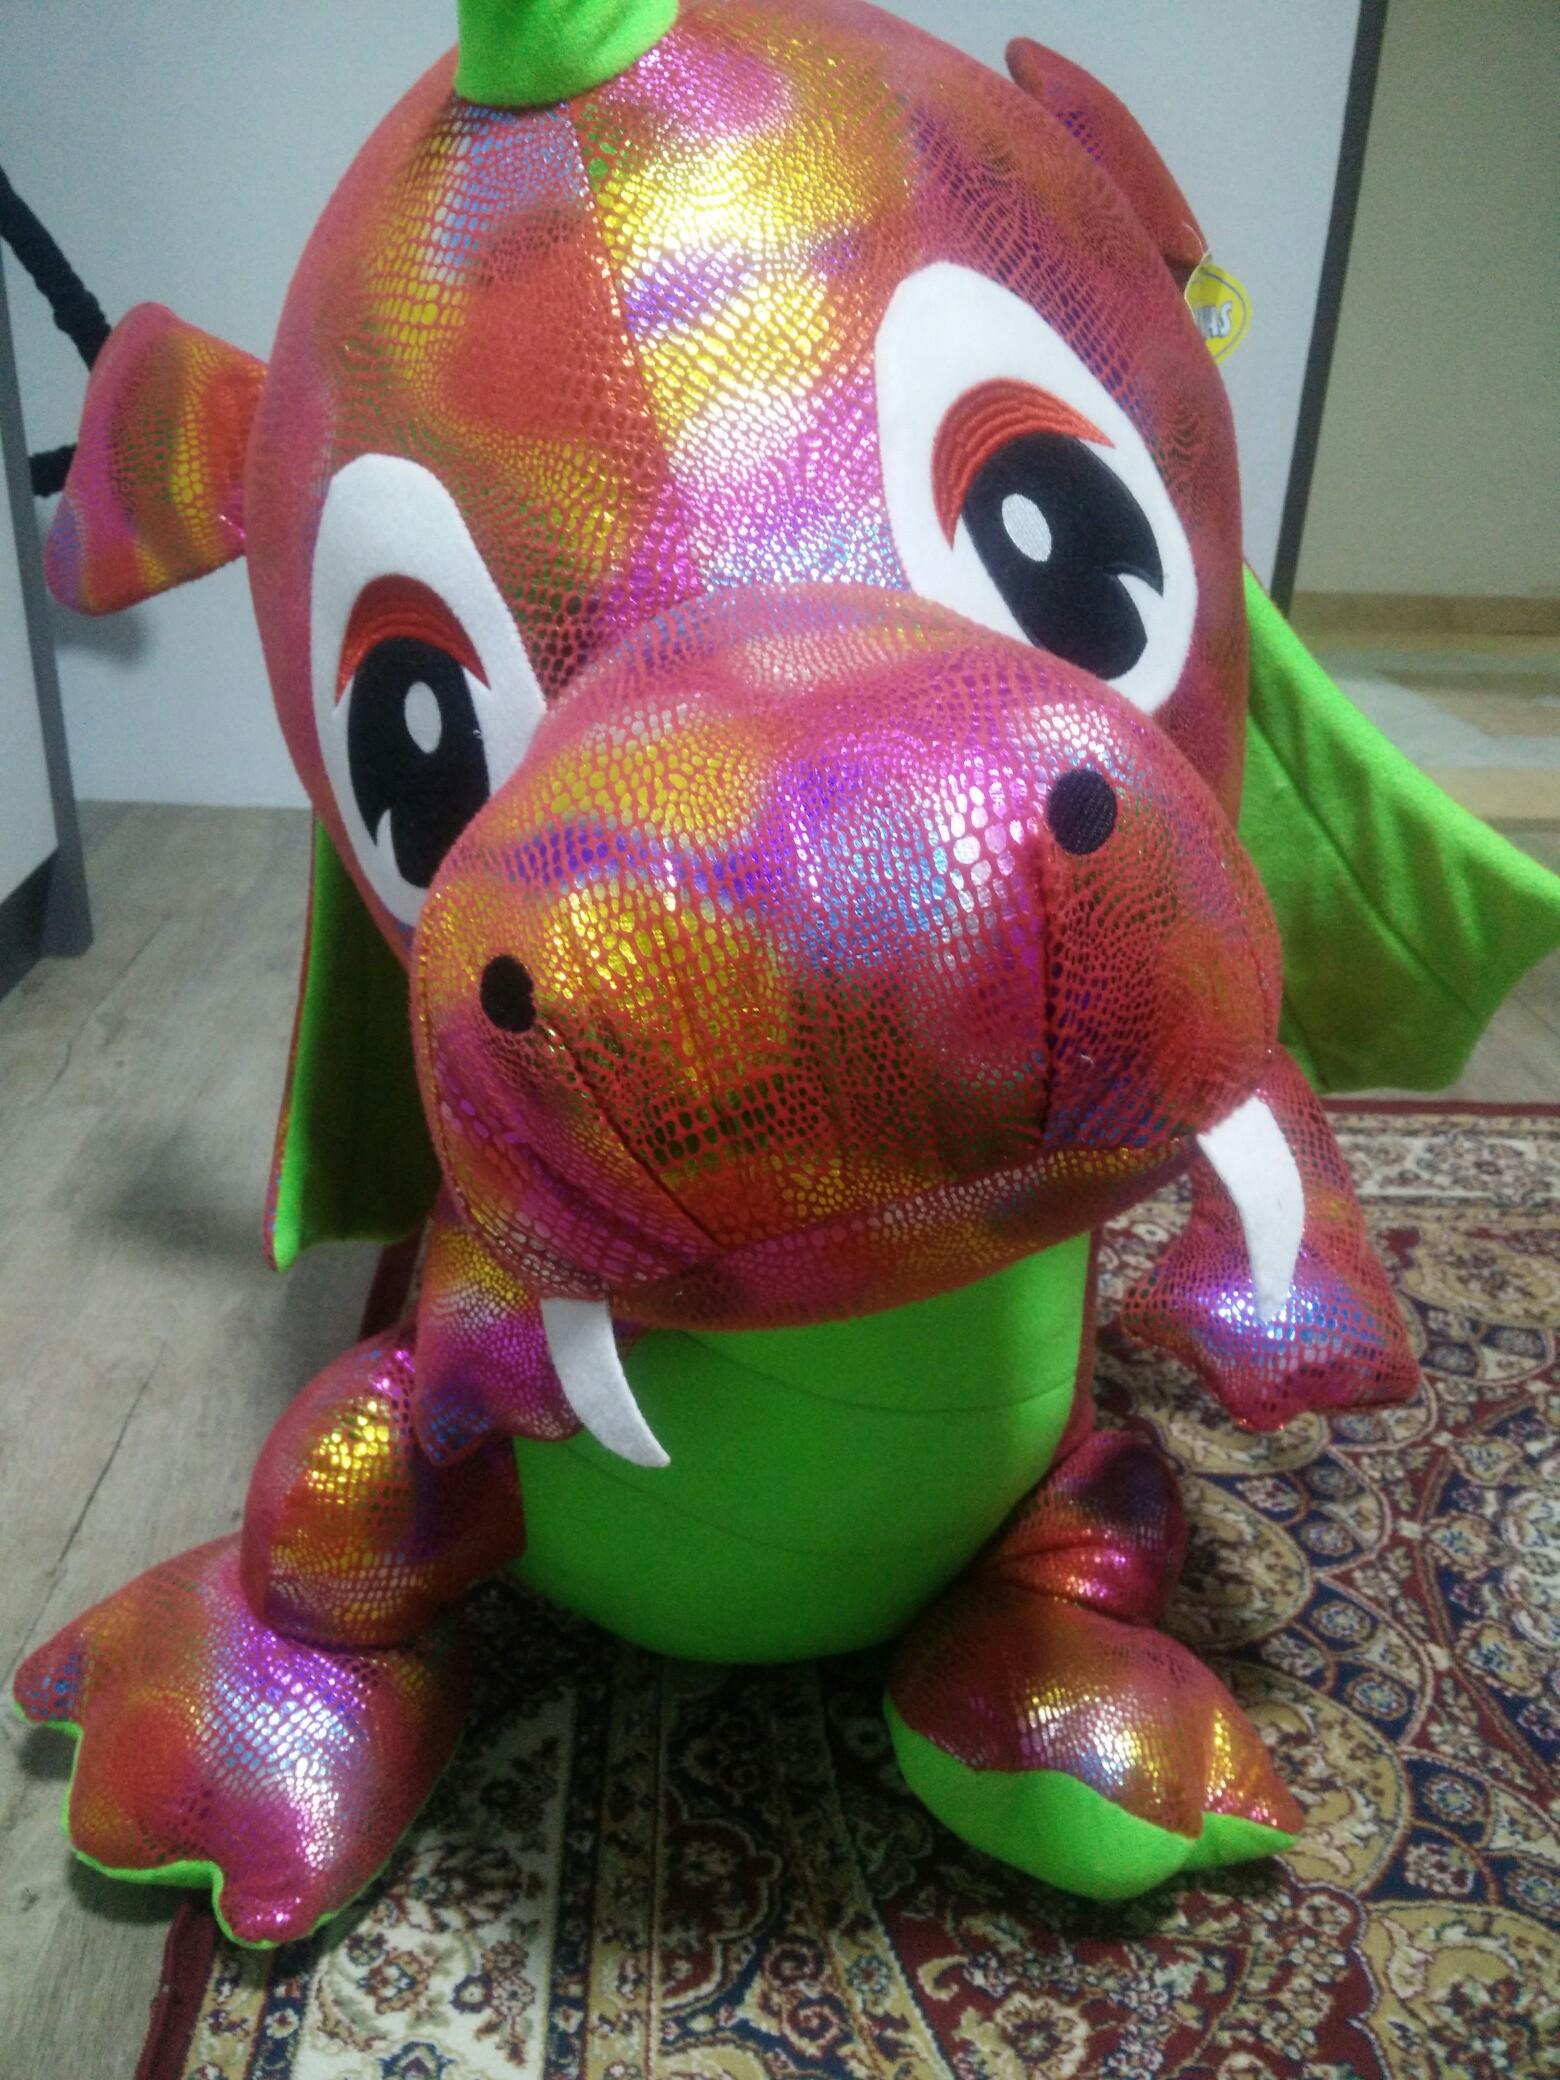 Big Dragon Stuffed Toy Toys Games Stuffed Toys On Carousell